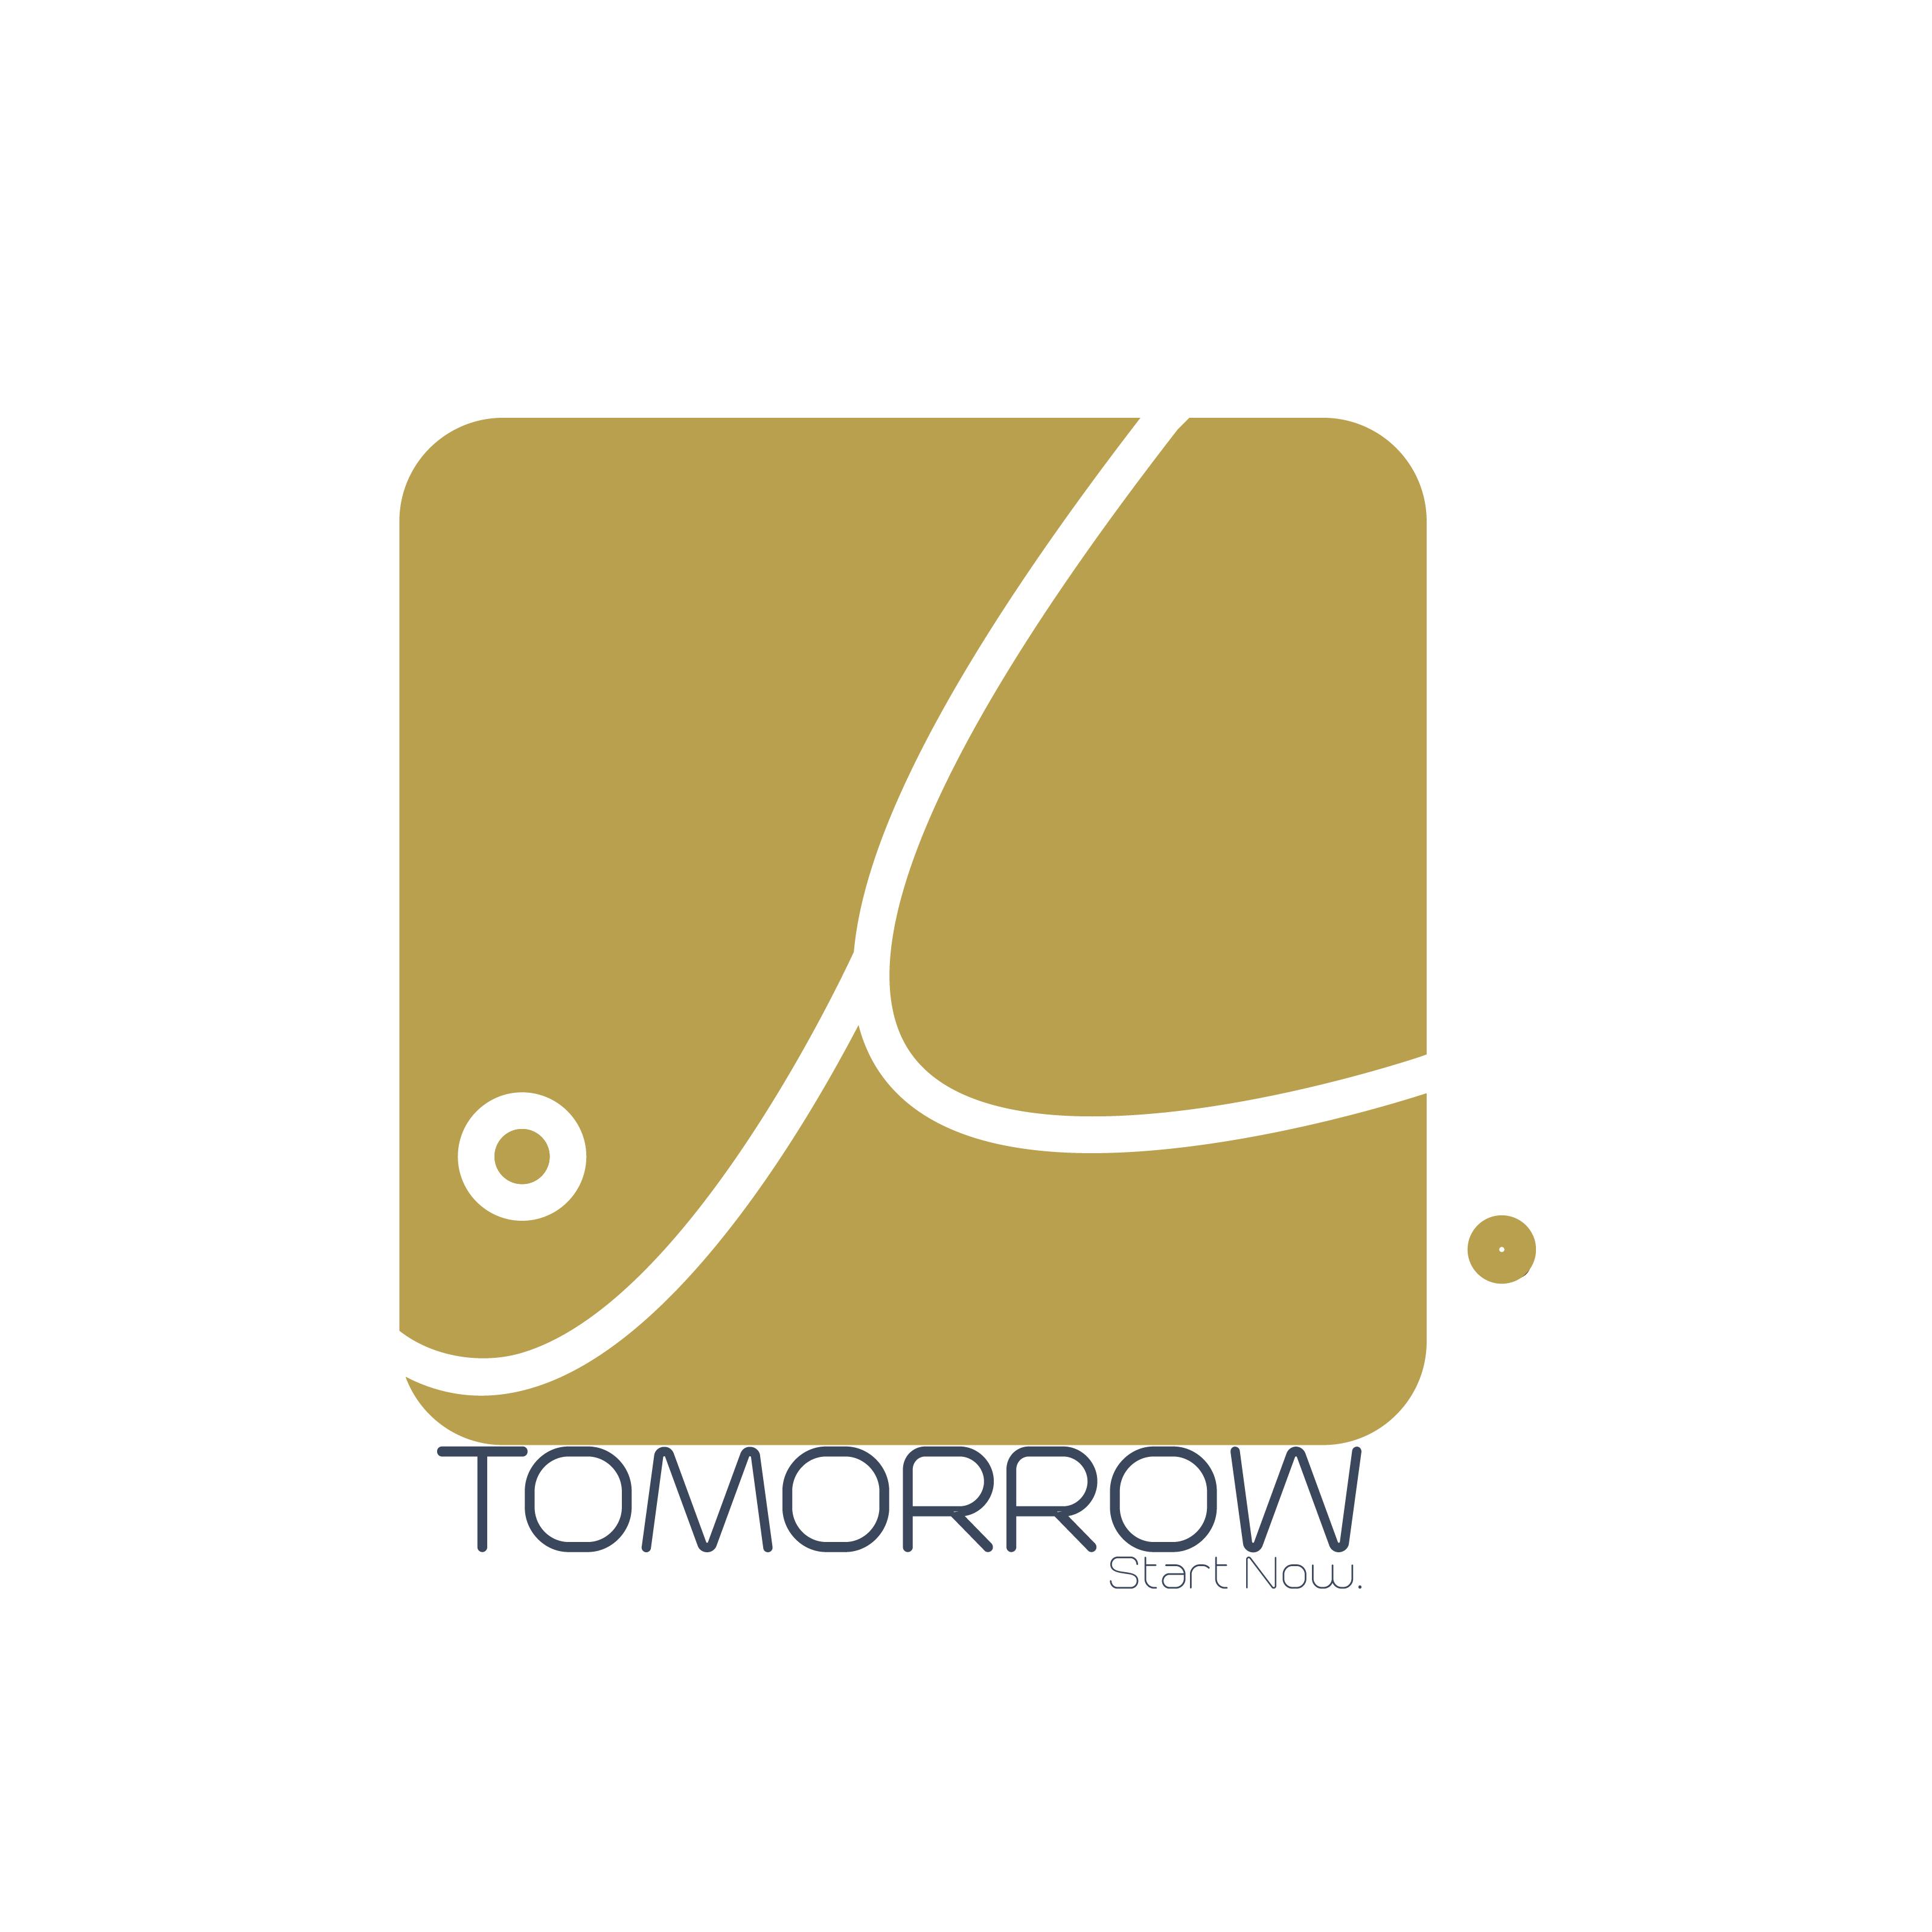 Tomorrow Solar